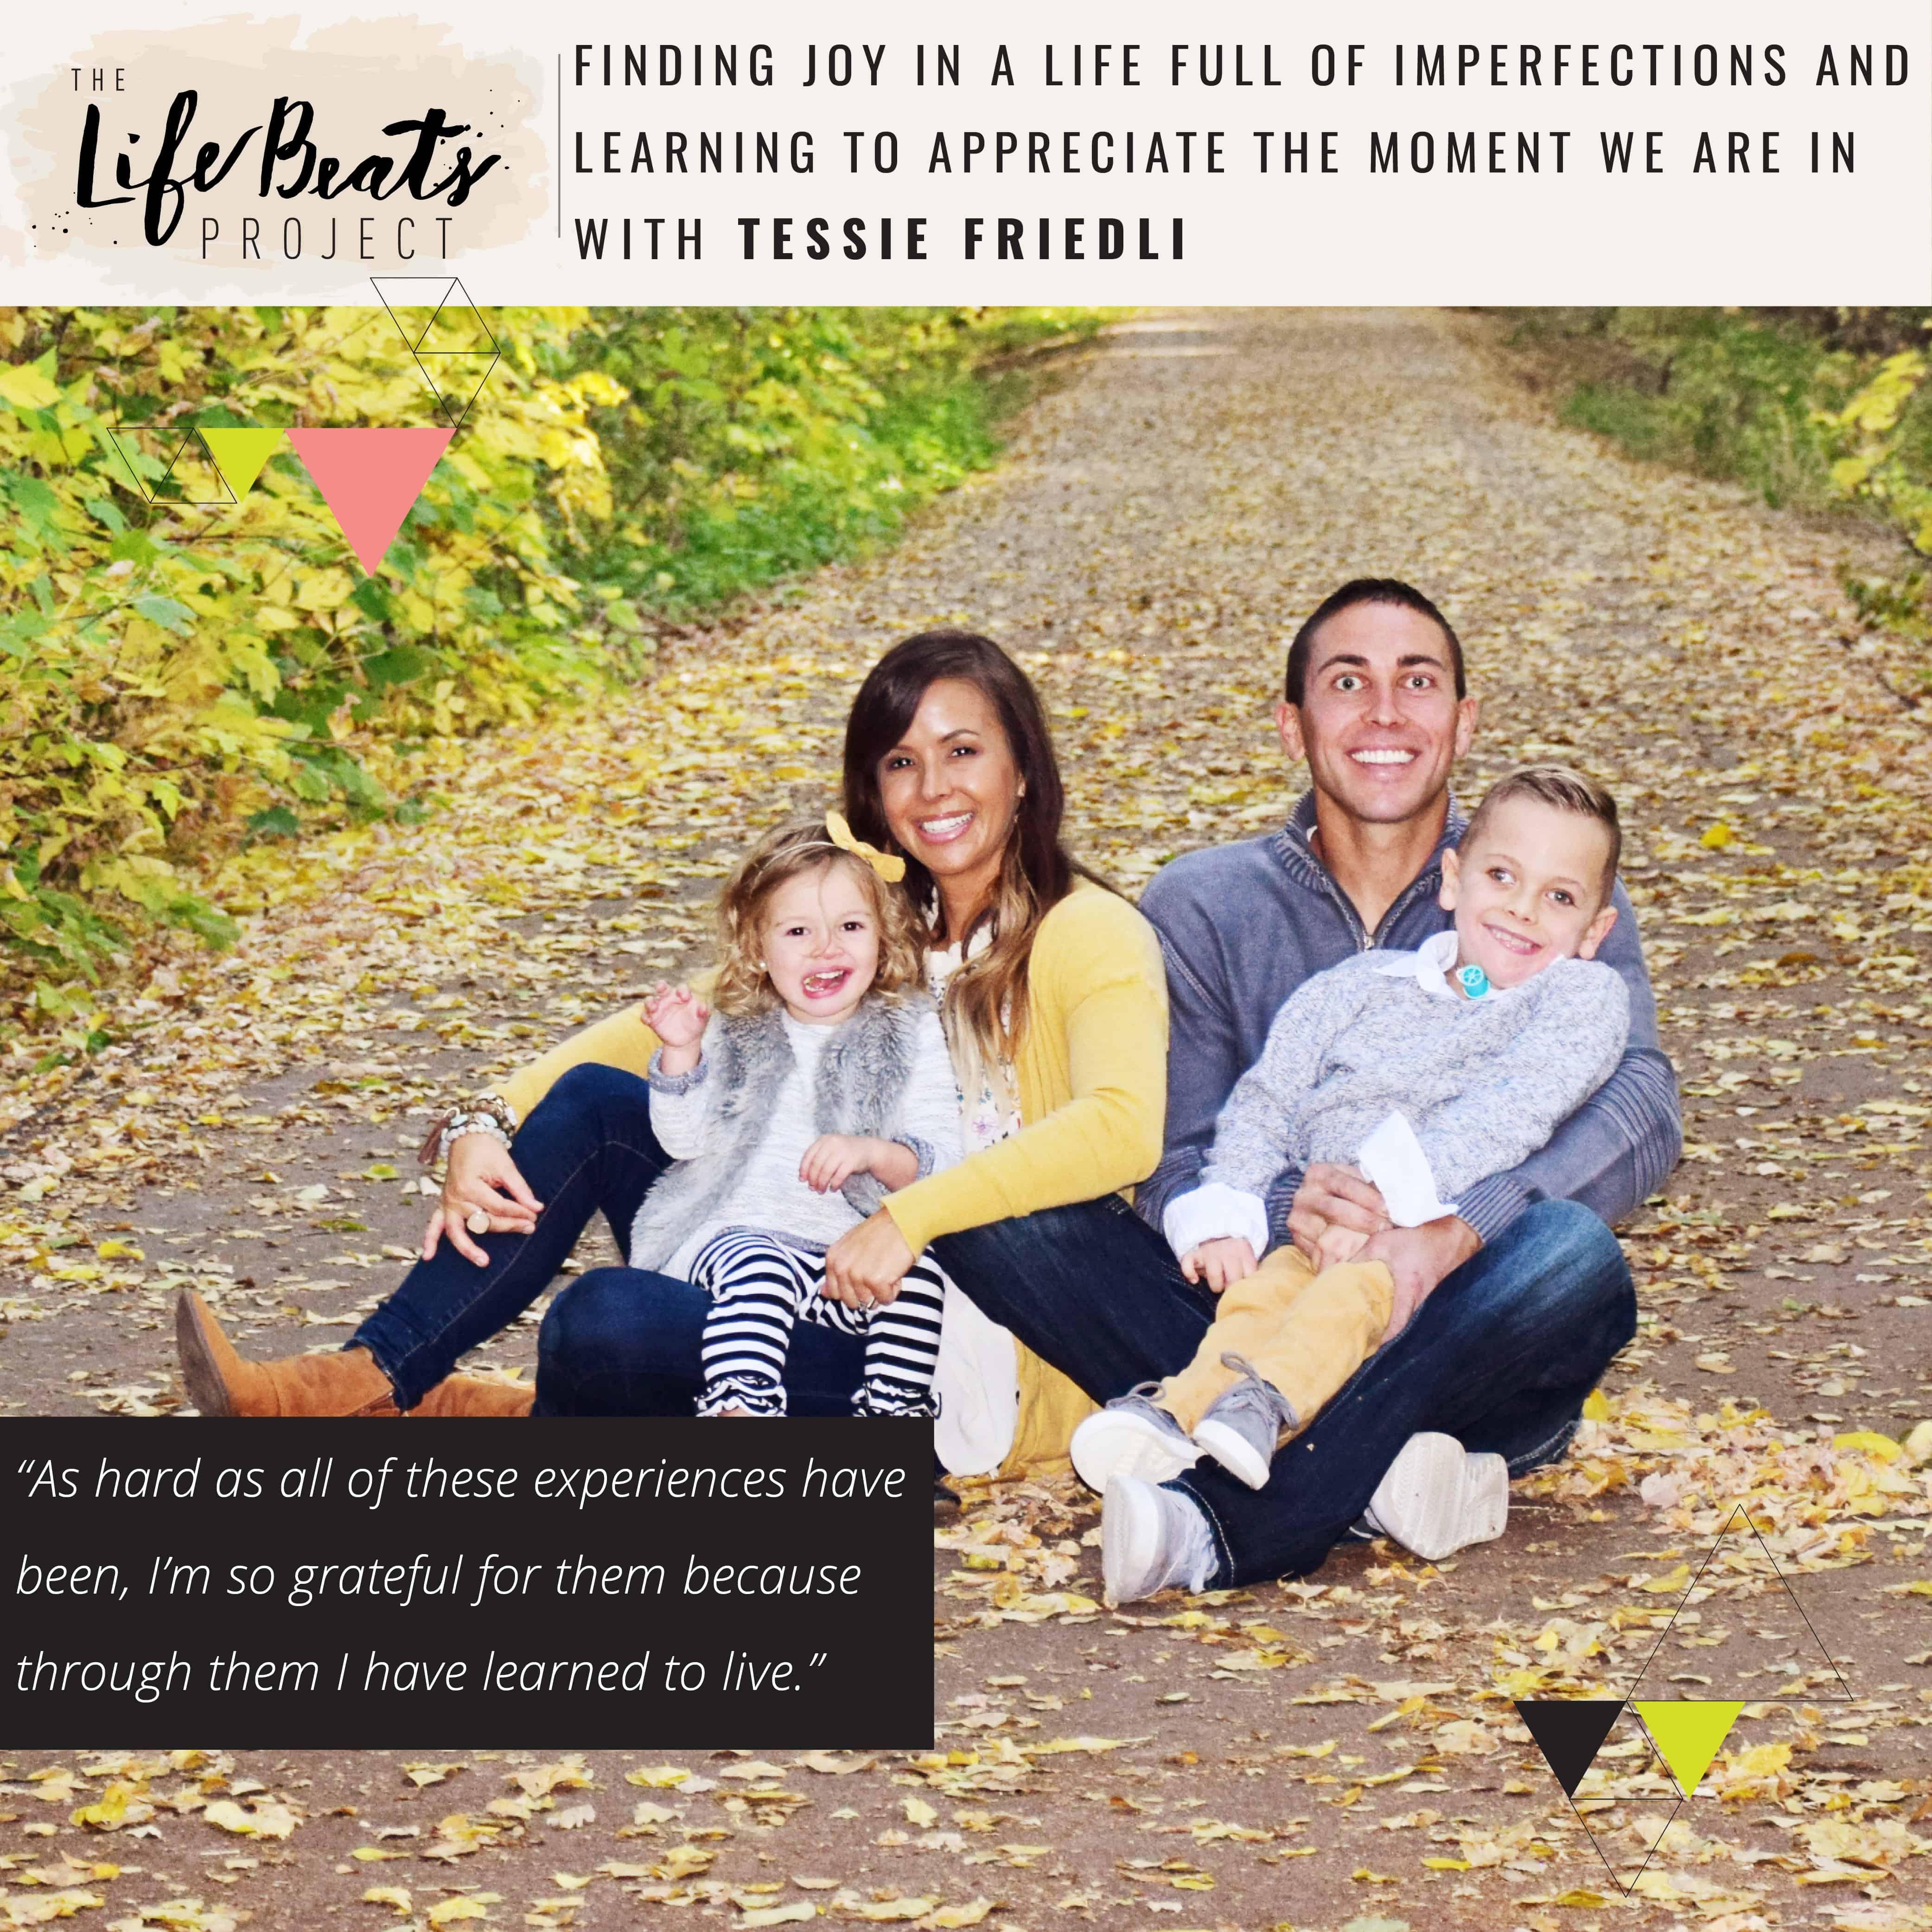 mother's day motherhood brain damage blind hope fear LifeBeats Podcast Tessie Friedli